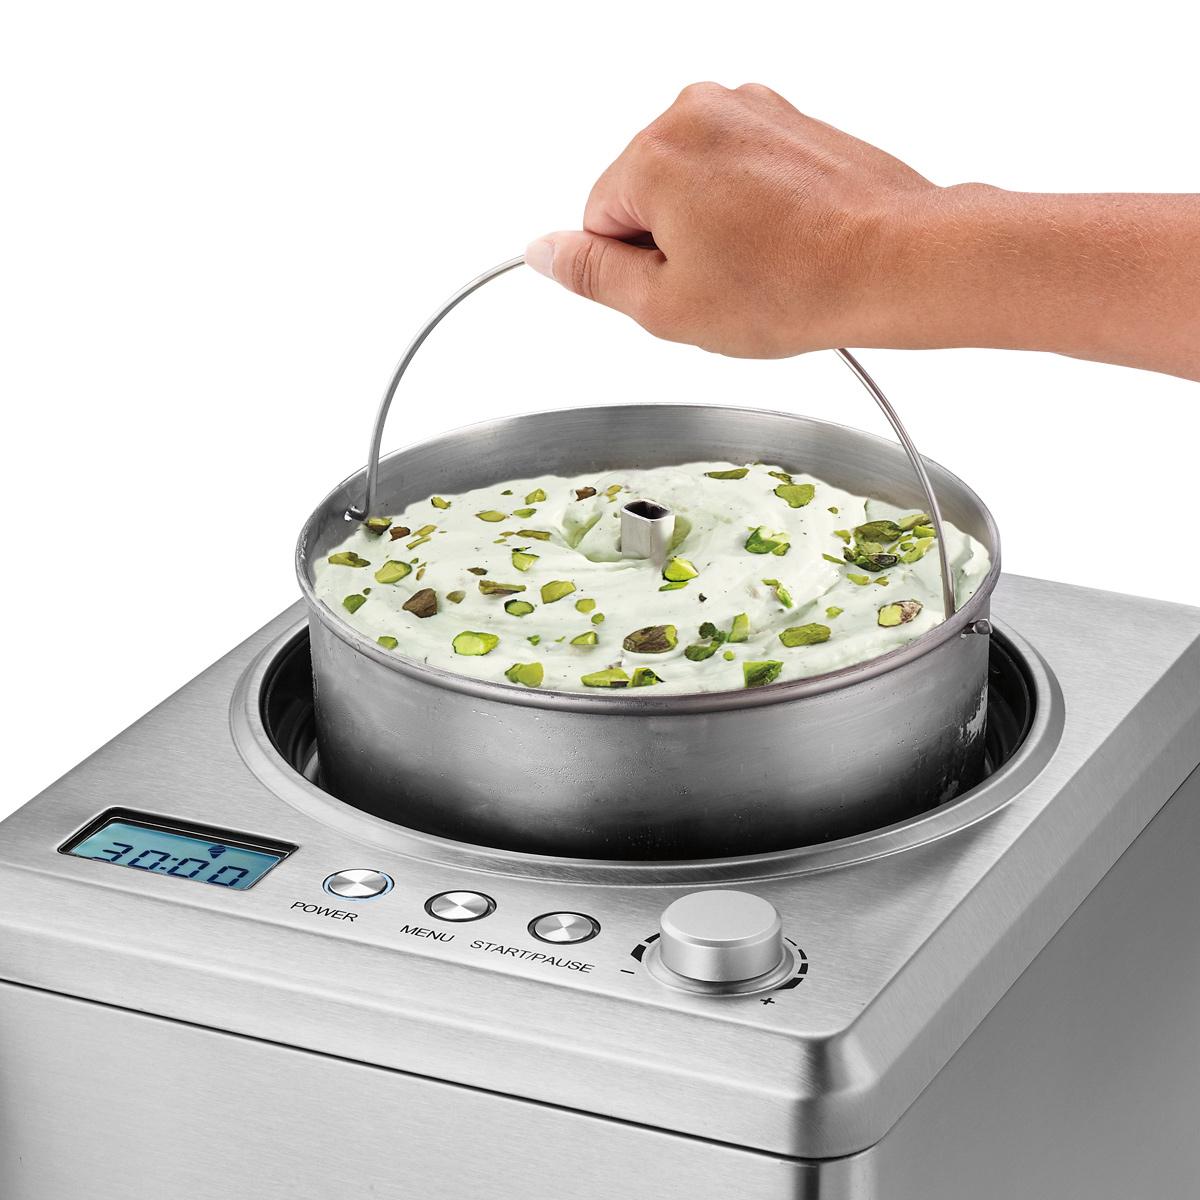 Waring WCIC25 ice cream base mix machine